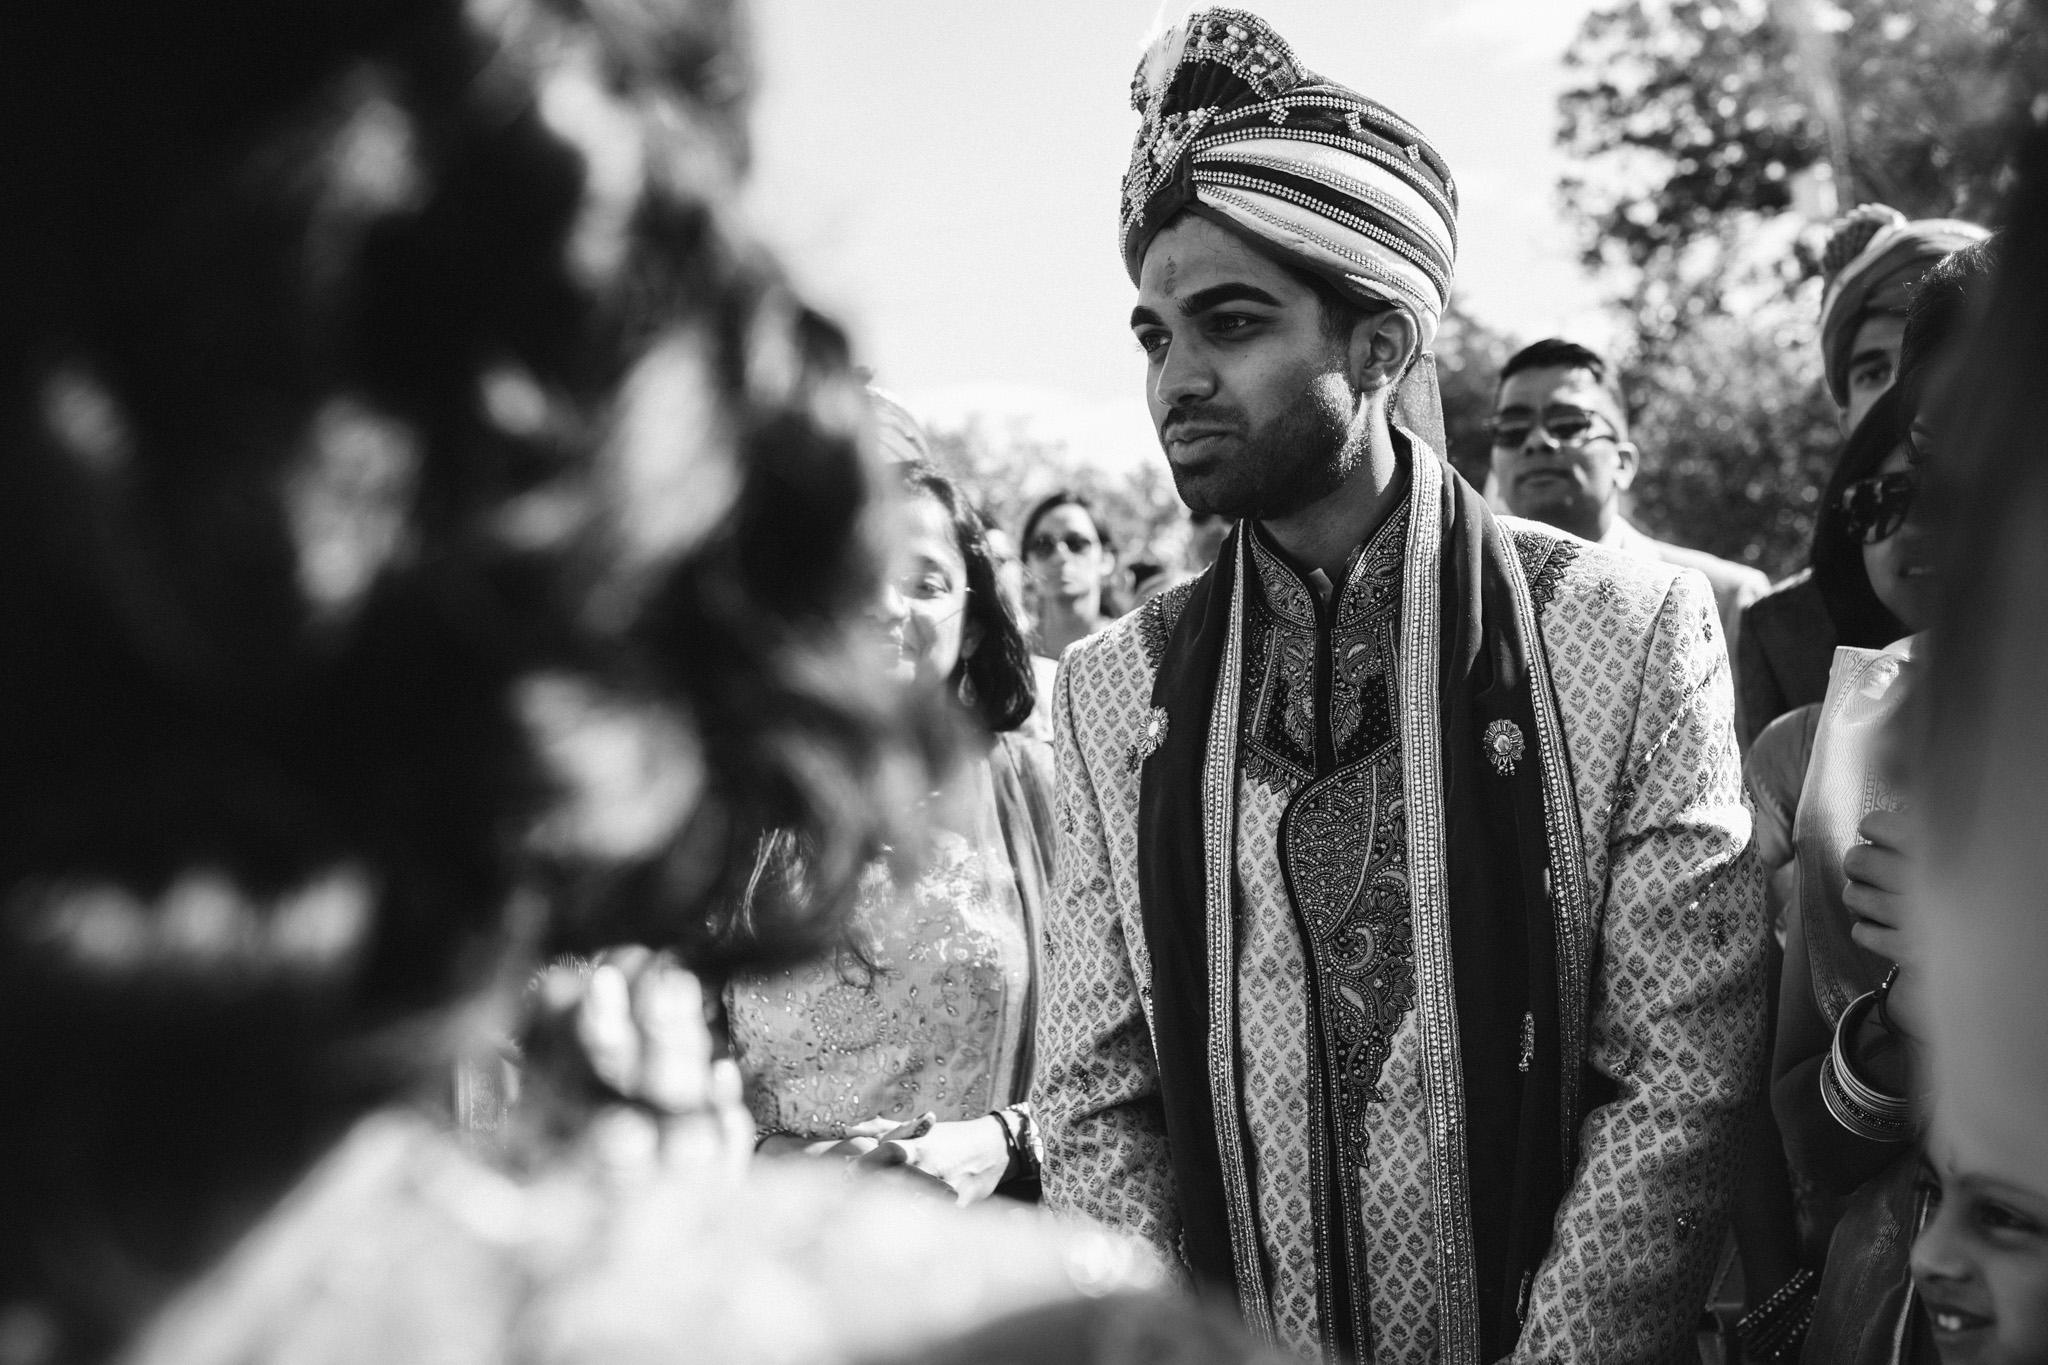 rebeccaburtphotography.hindiwedding.moraisvineyards.virginiawedding-115.JPG